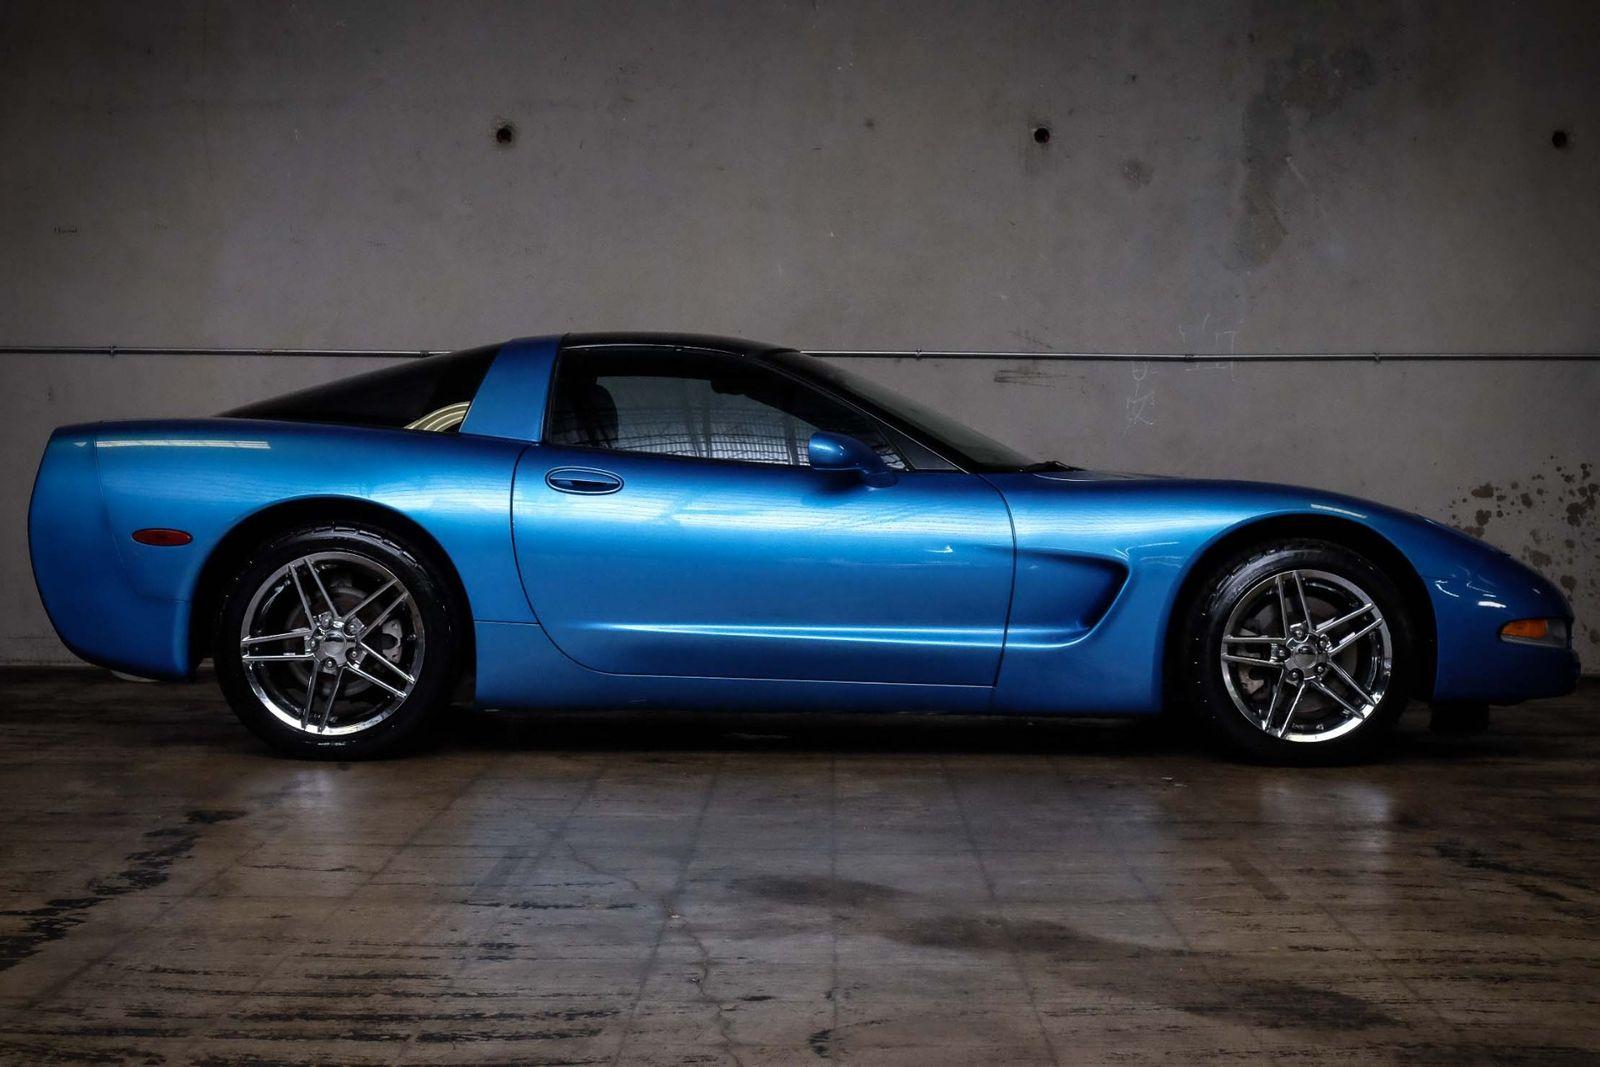 2000 Blue Chevrolet Corvette   | C5 Corvette Photo 5